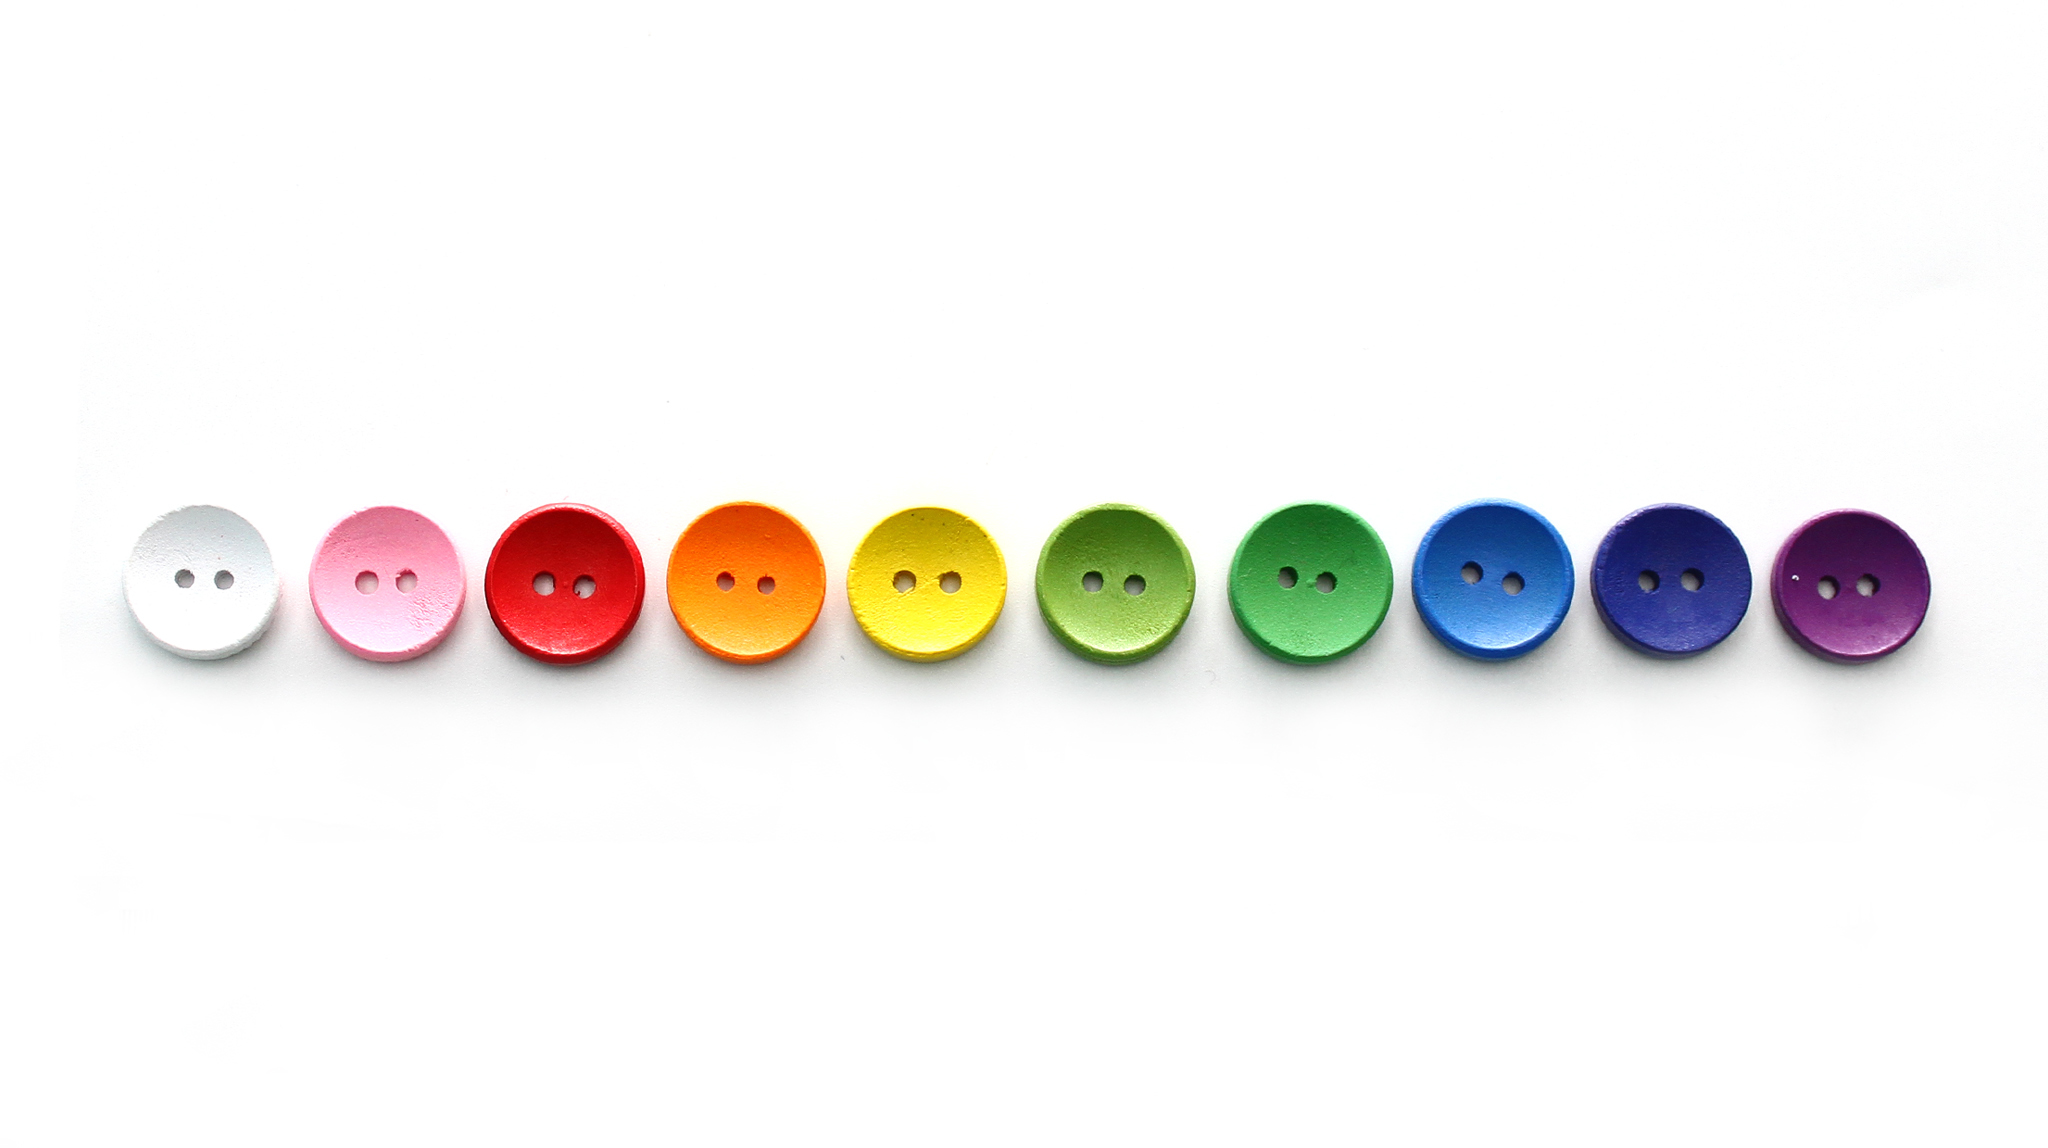 Пуговица разноцветная, 14 мм